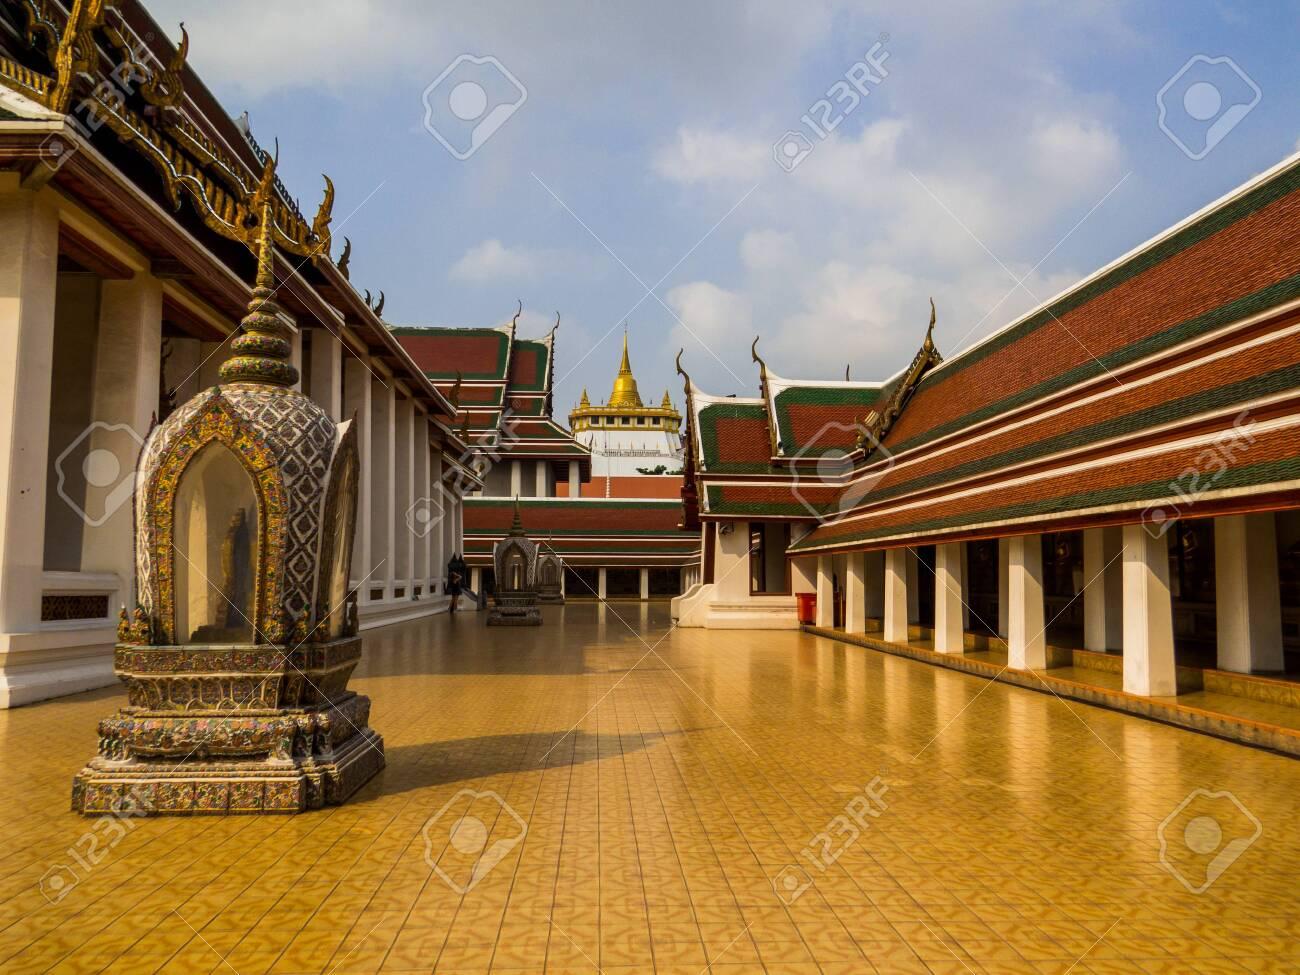 Bangkok, Thailand - January 16, 2020: View of the Wat Saket (or Golden Mount). - 151449105